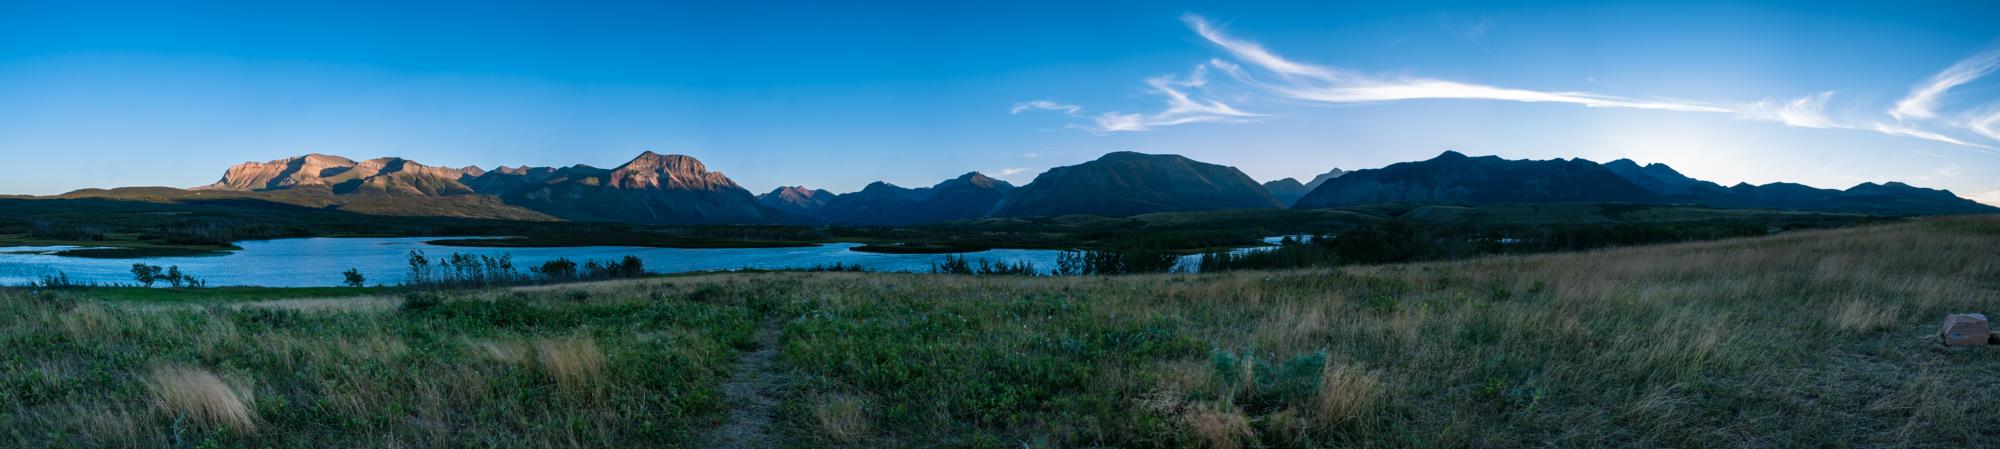 Waterton Lakes National Park, July 2015